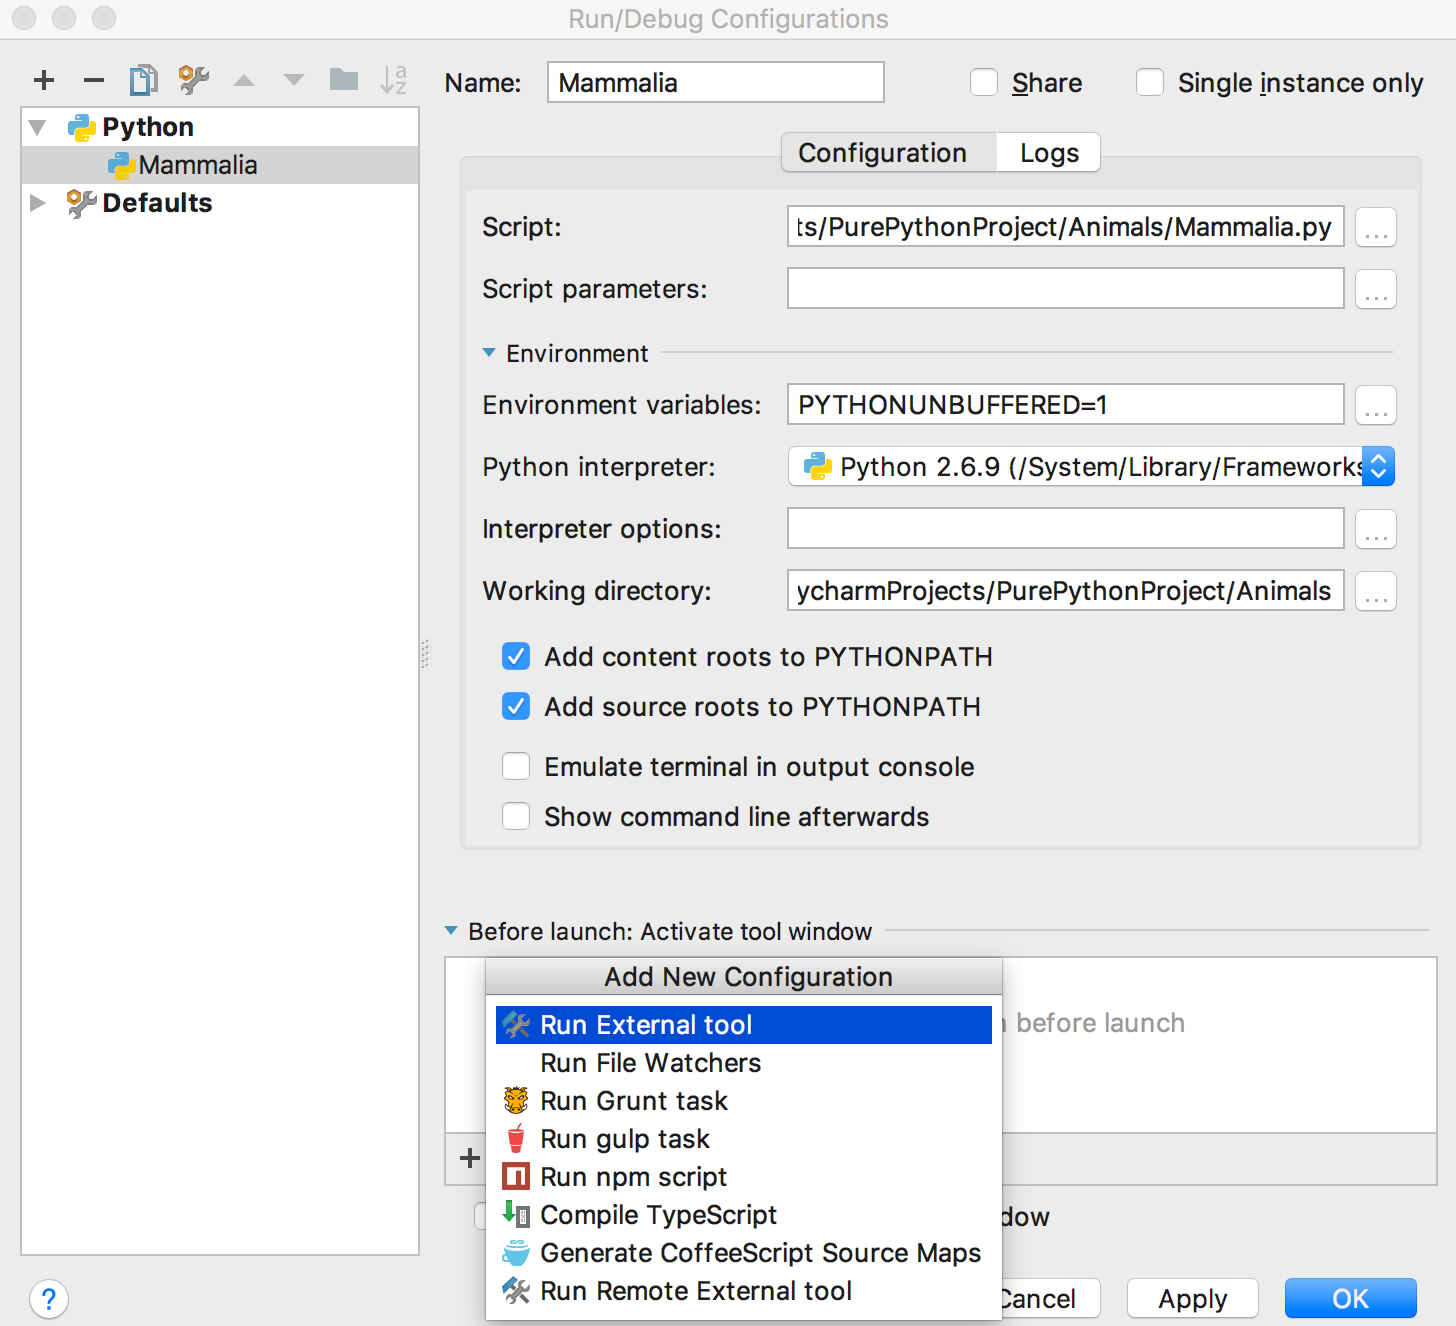 py QST runDebugConfiguration